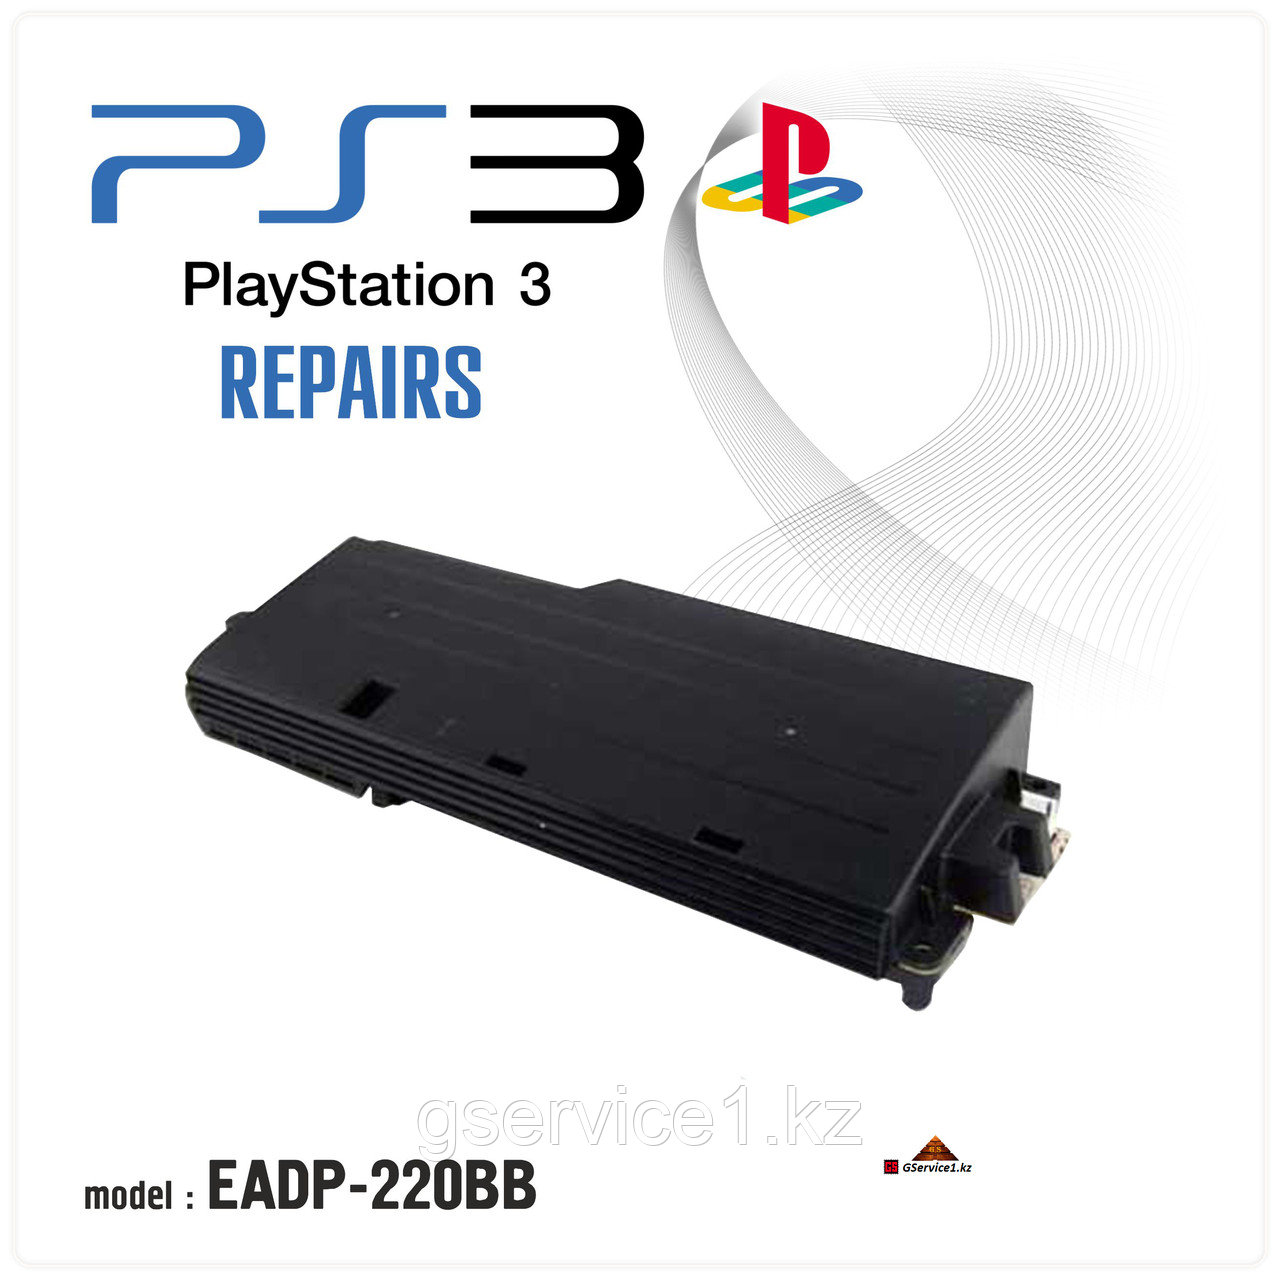 PS 3 Slim Internal Power Supply model EADP-220BB